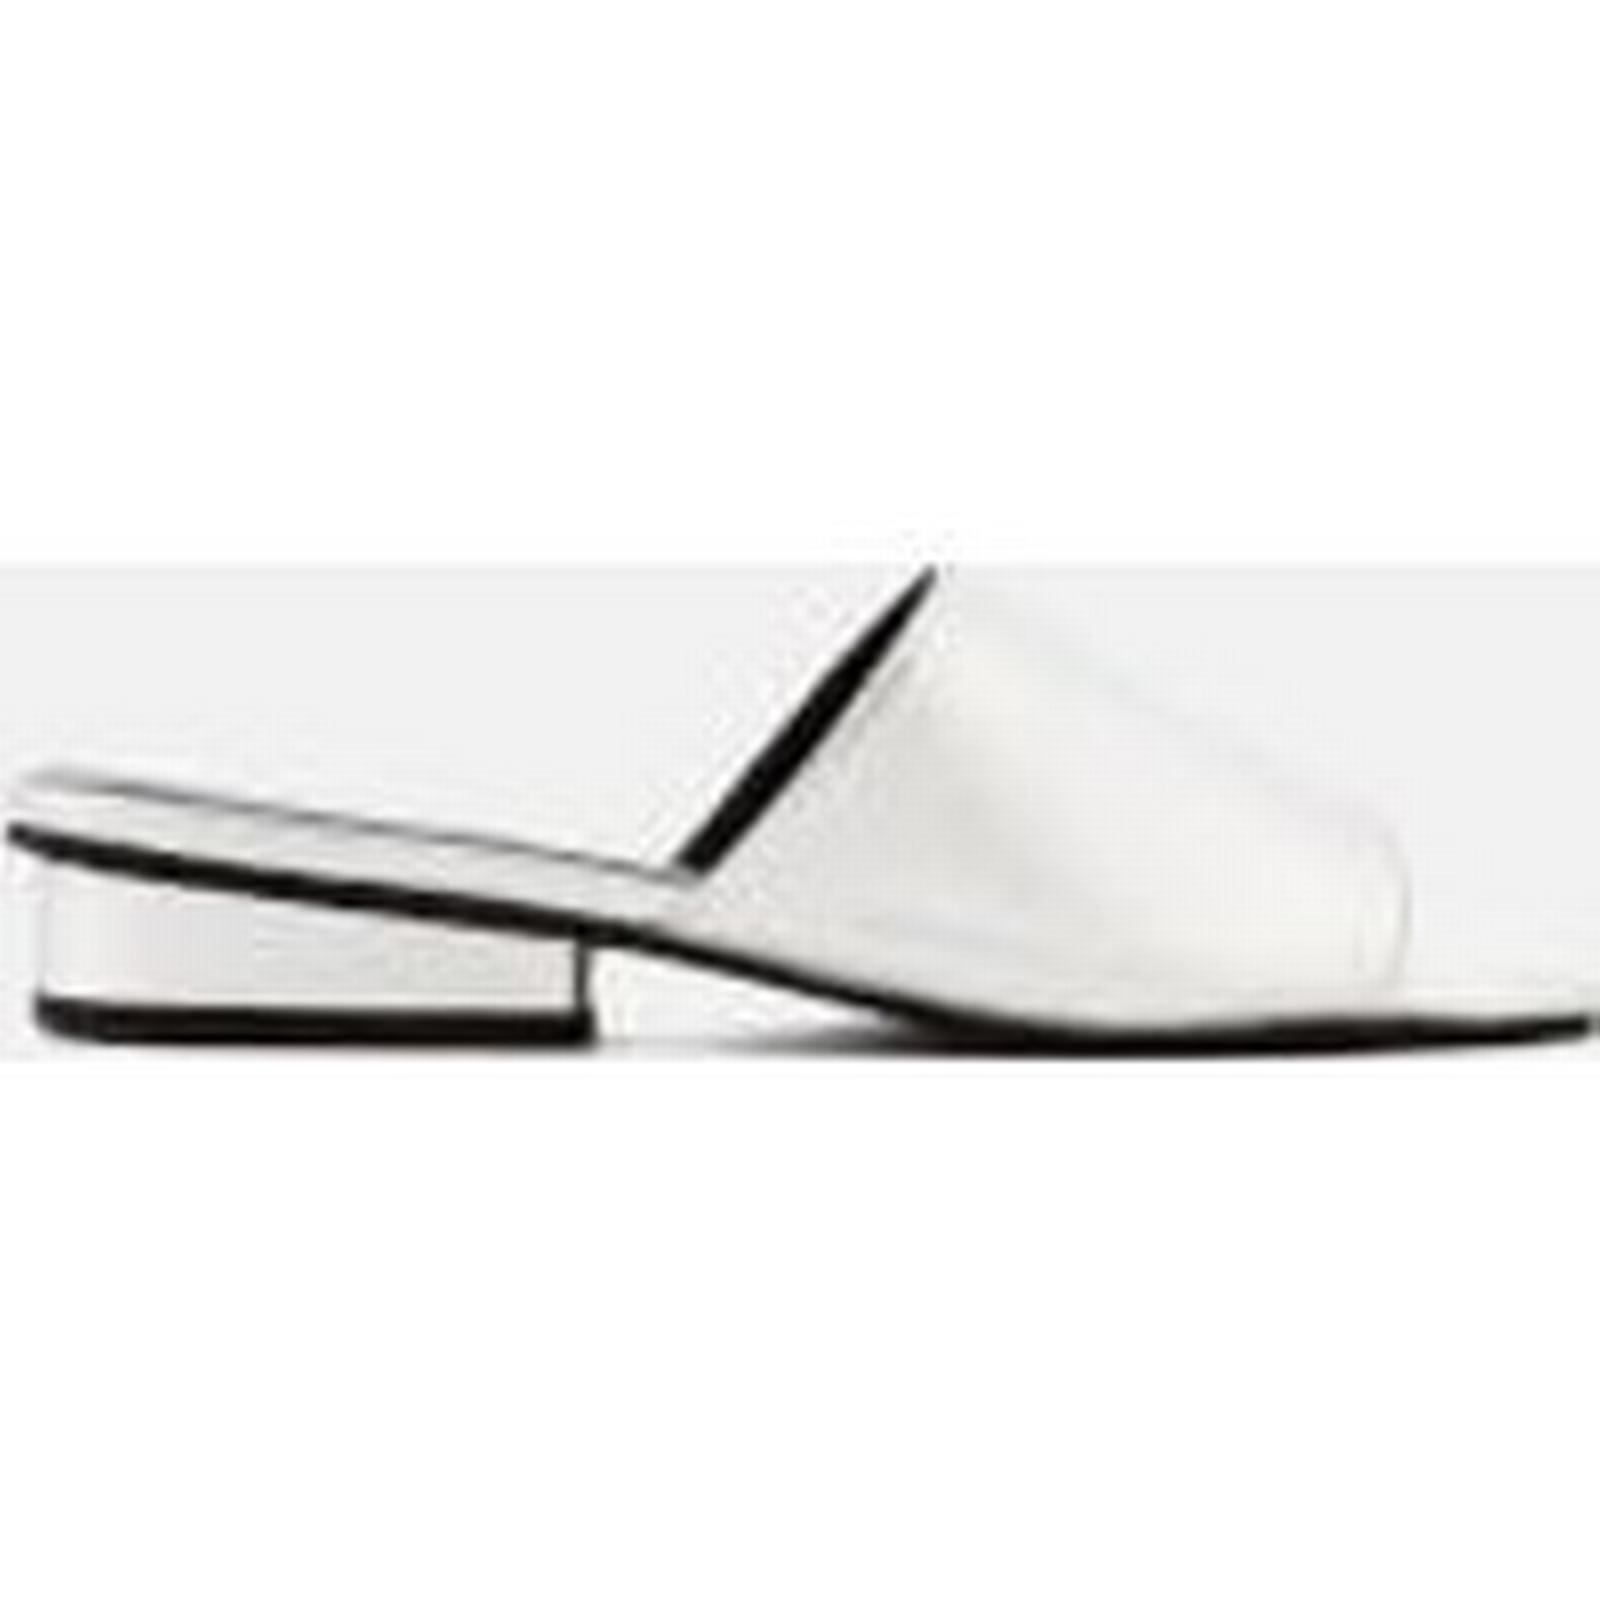 Sol Leather Sana Women's Hamilton Leather Sol Flat Mules - Silver 70cedd